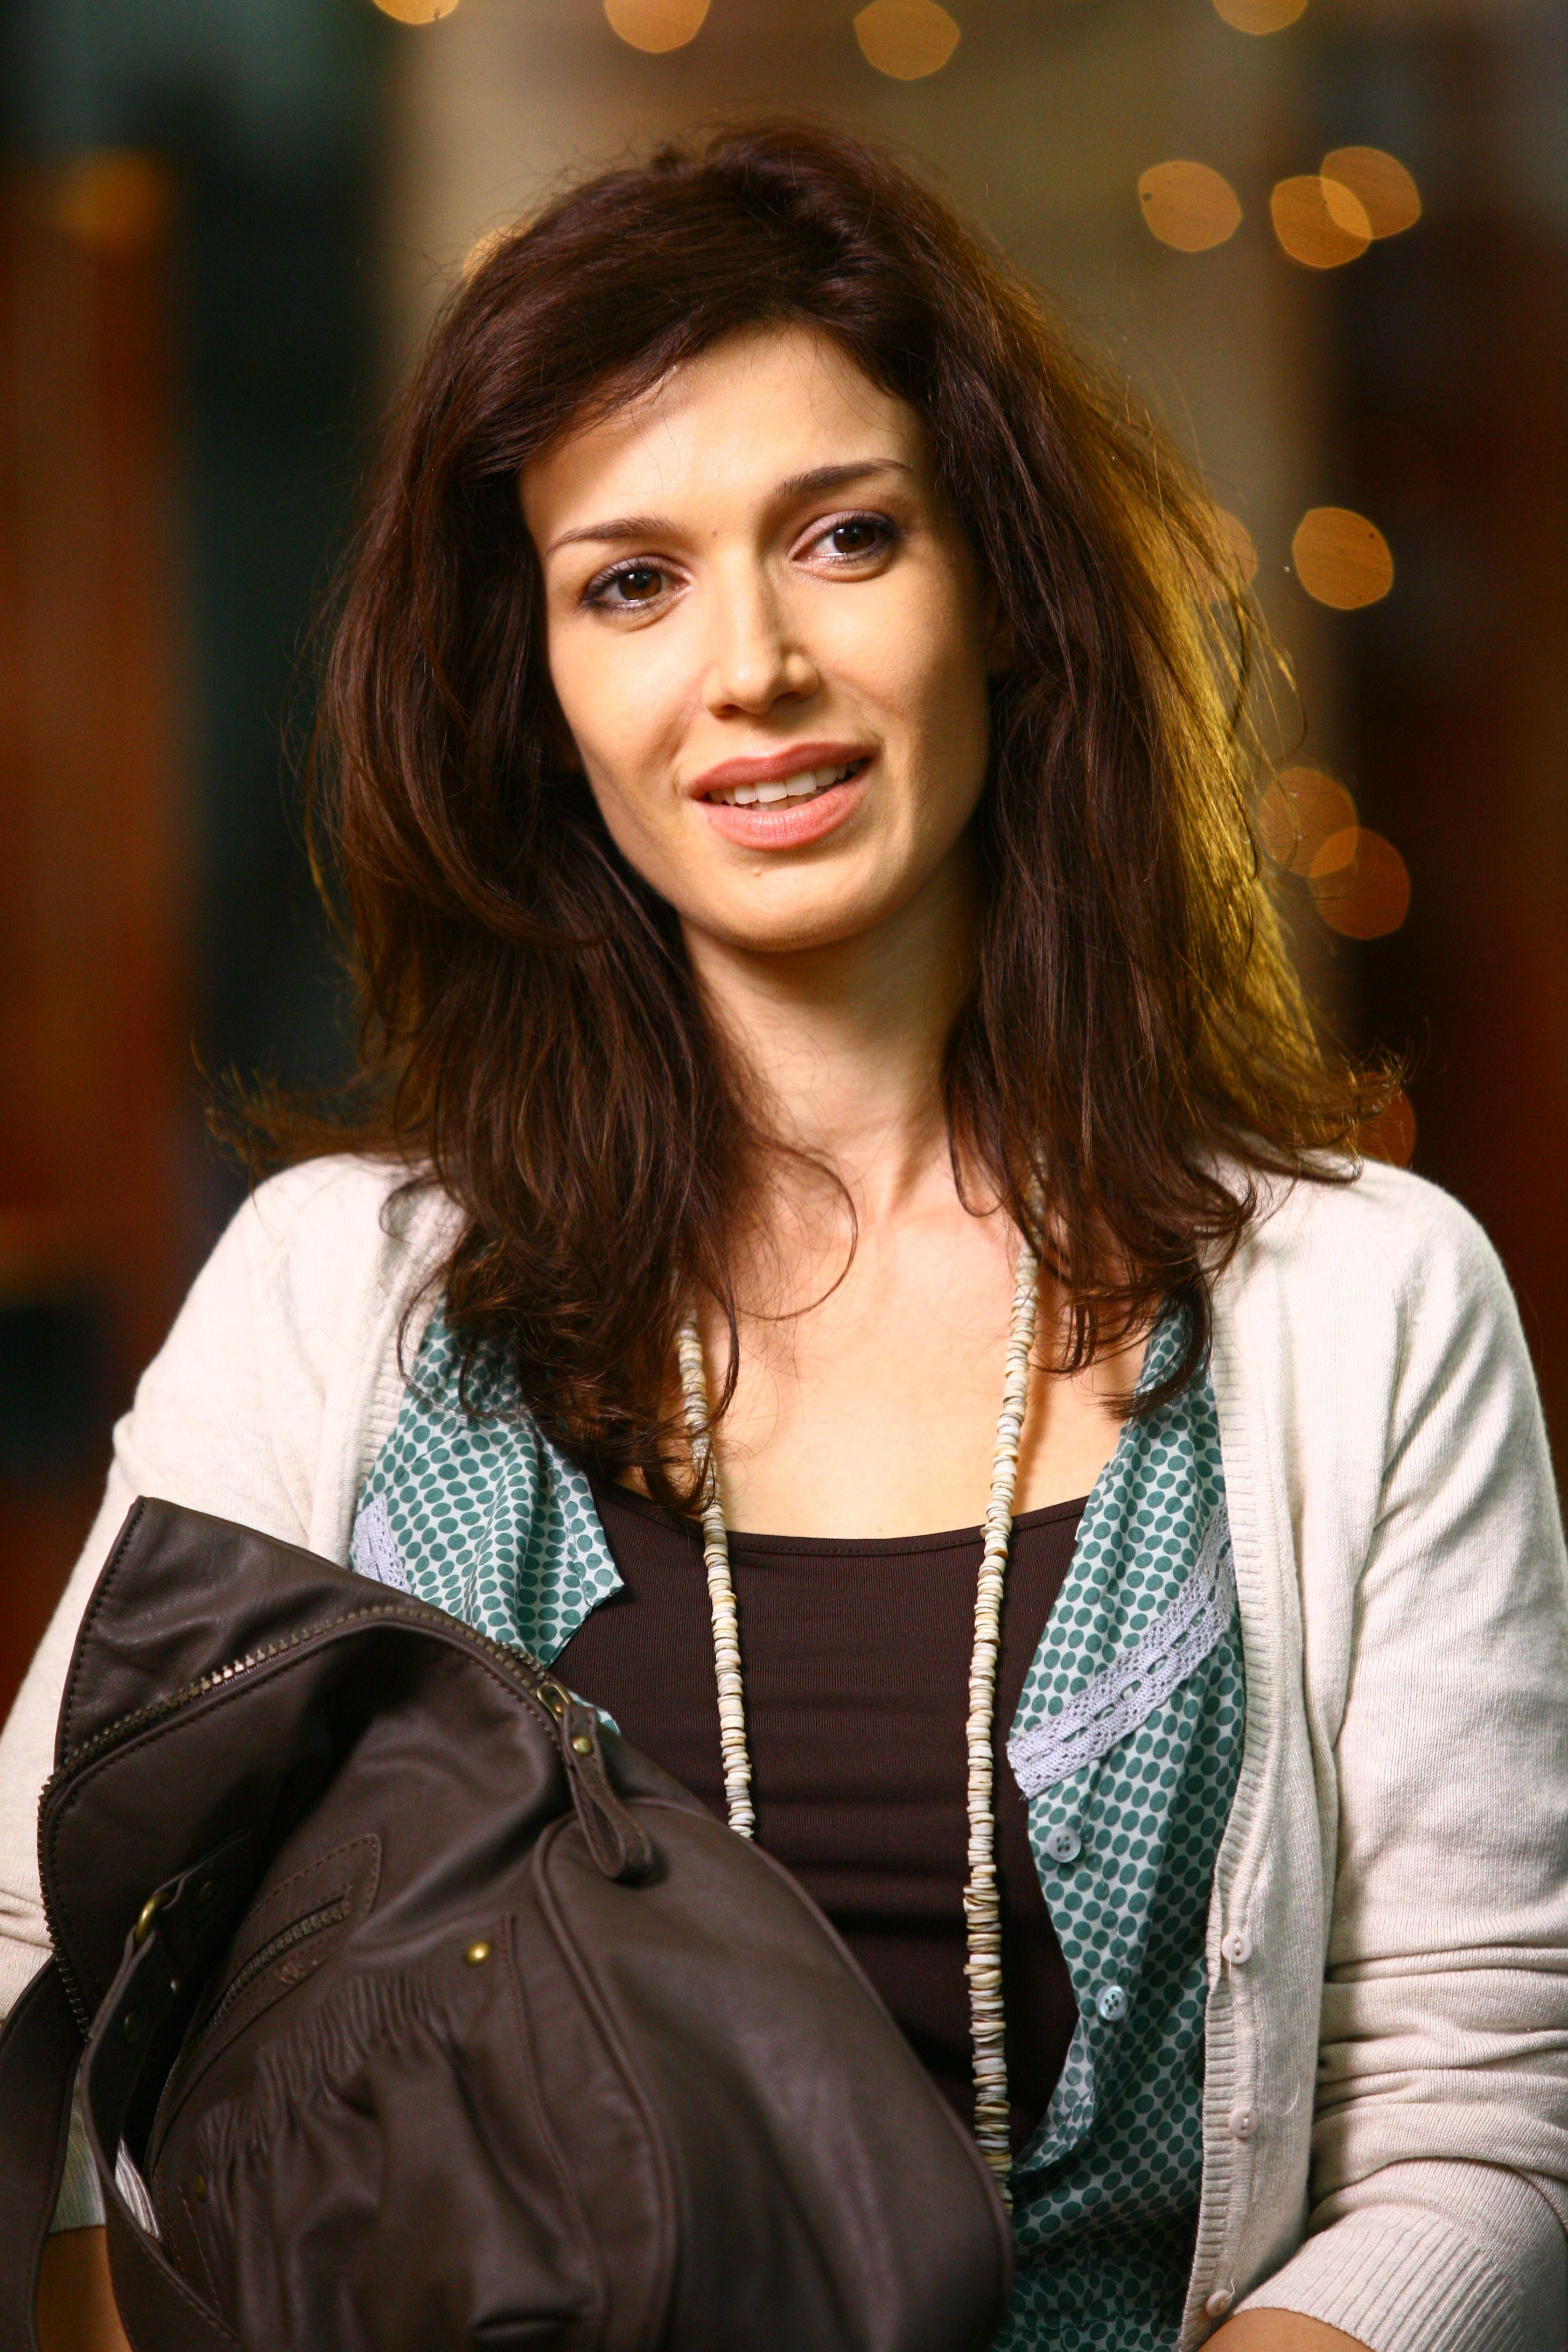 Poze Alina Chivulescu - Actor - Poza 15 din 55 - CineMagia.ro